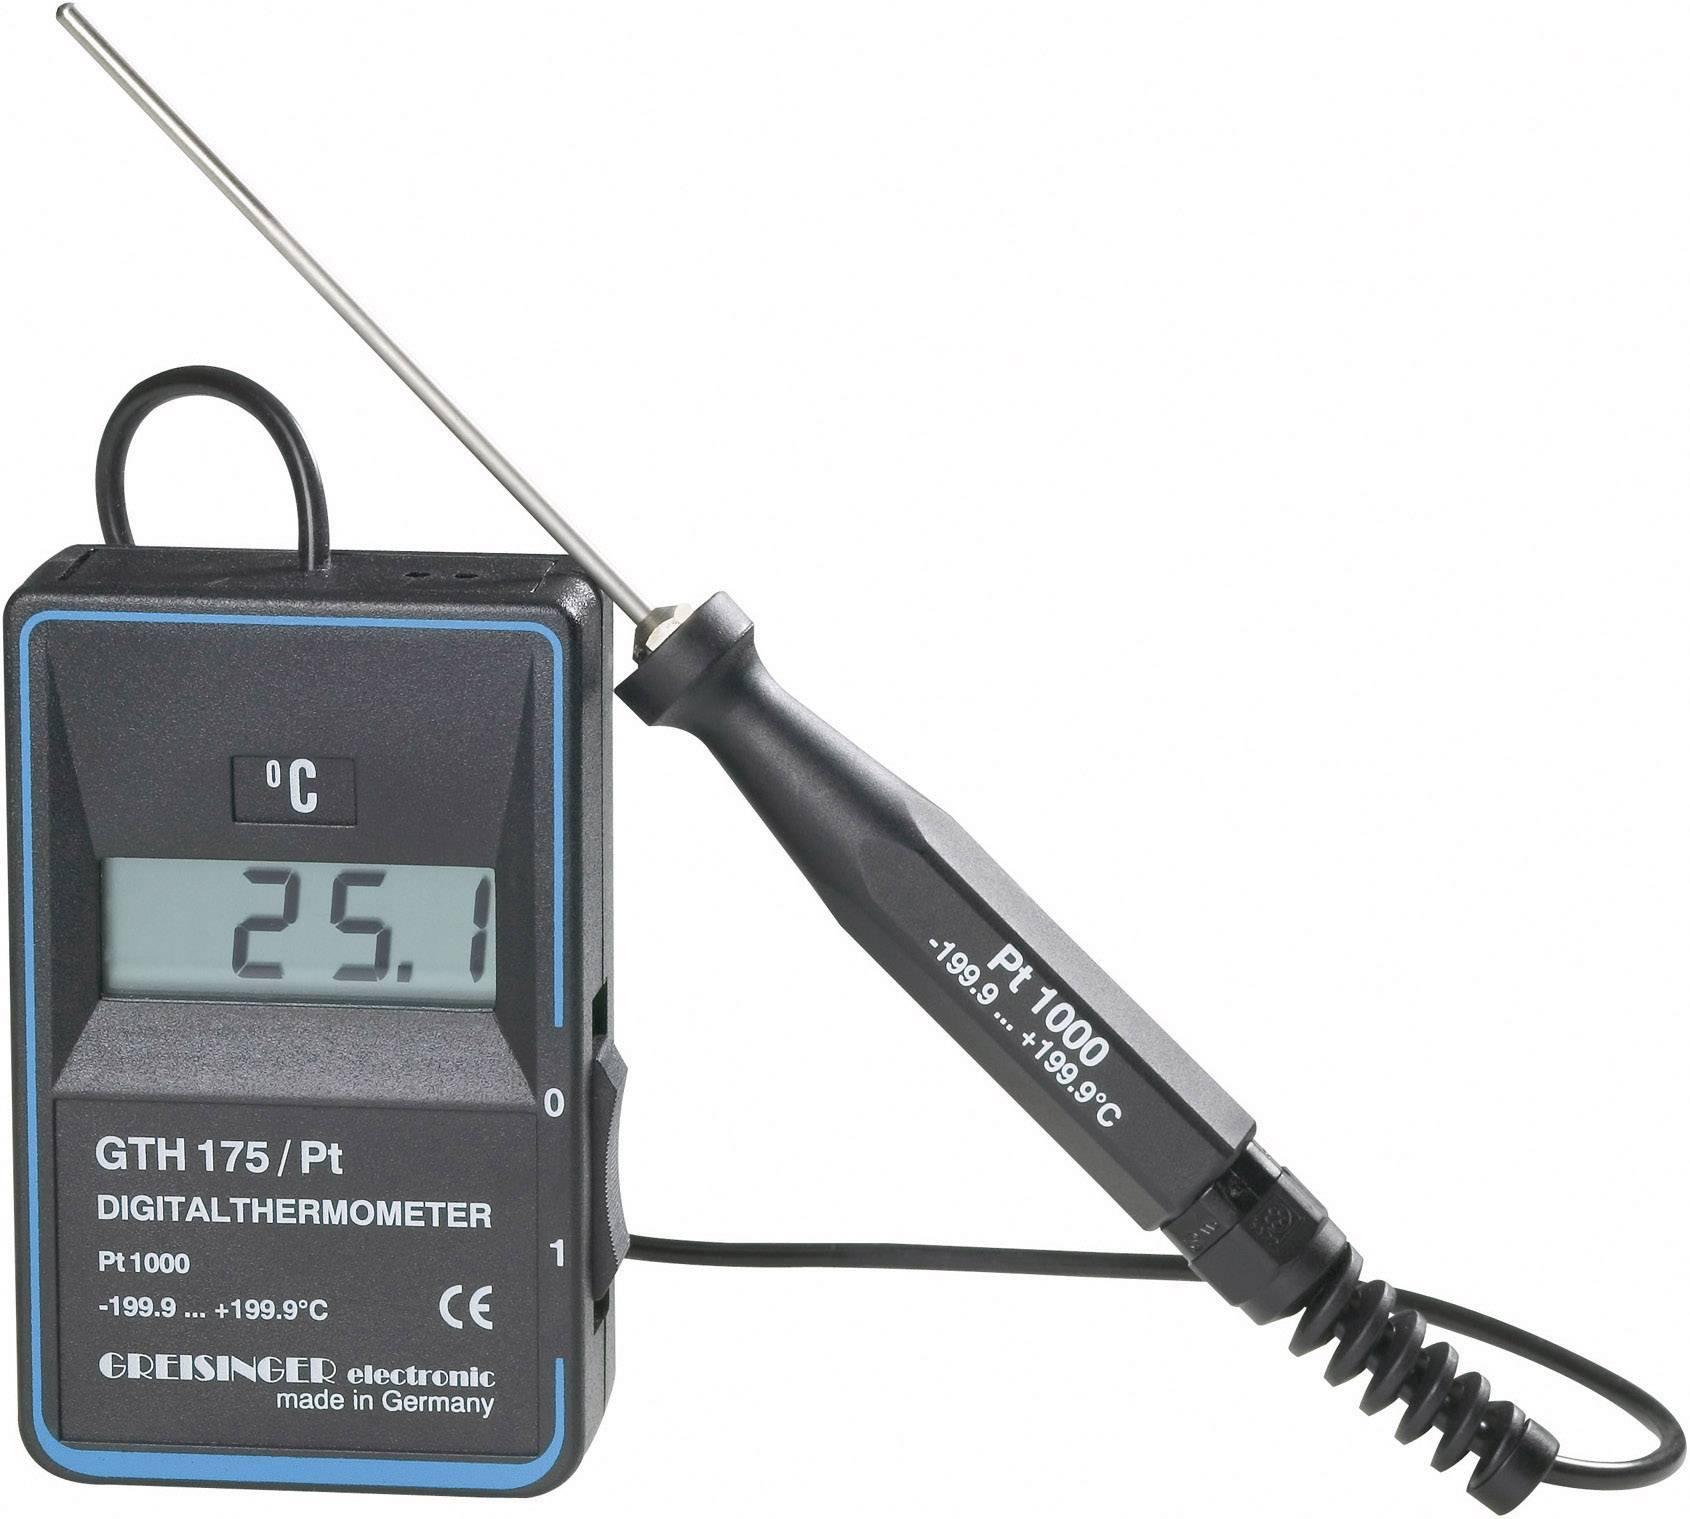 Vpichovací teploměr Greisinger GTH175/PT, -199,9 až +199,9 °C, 100390